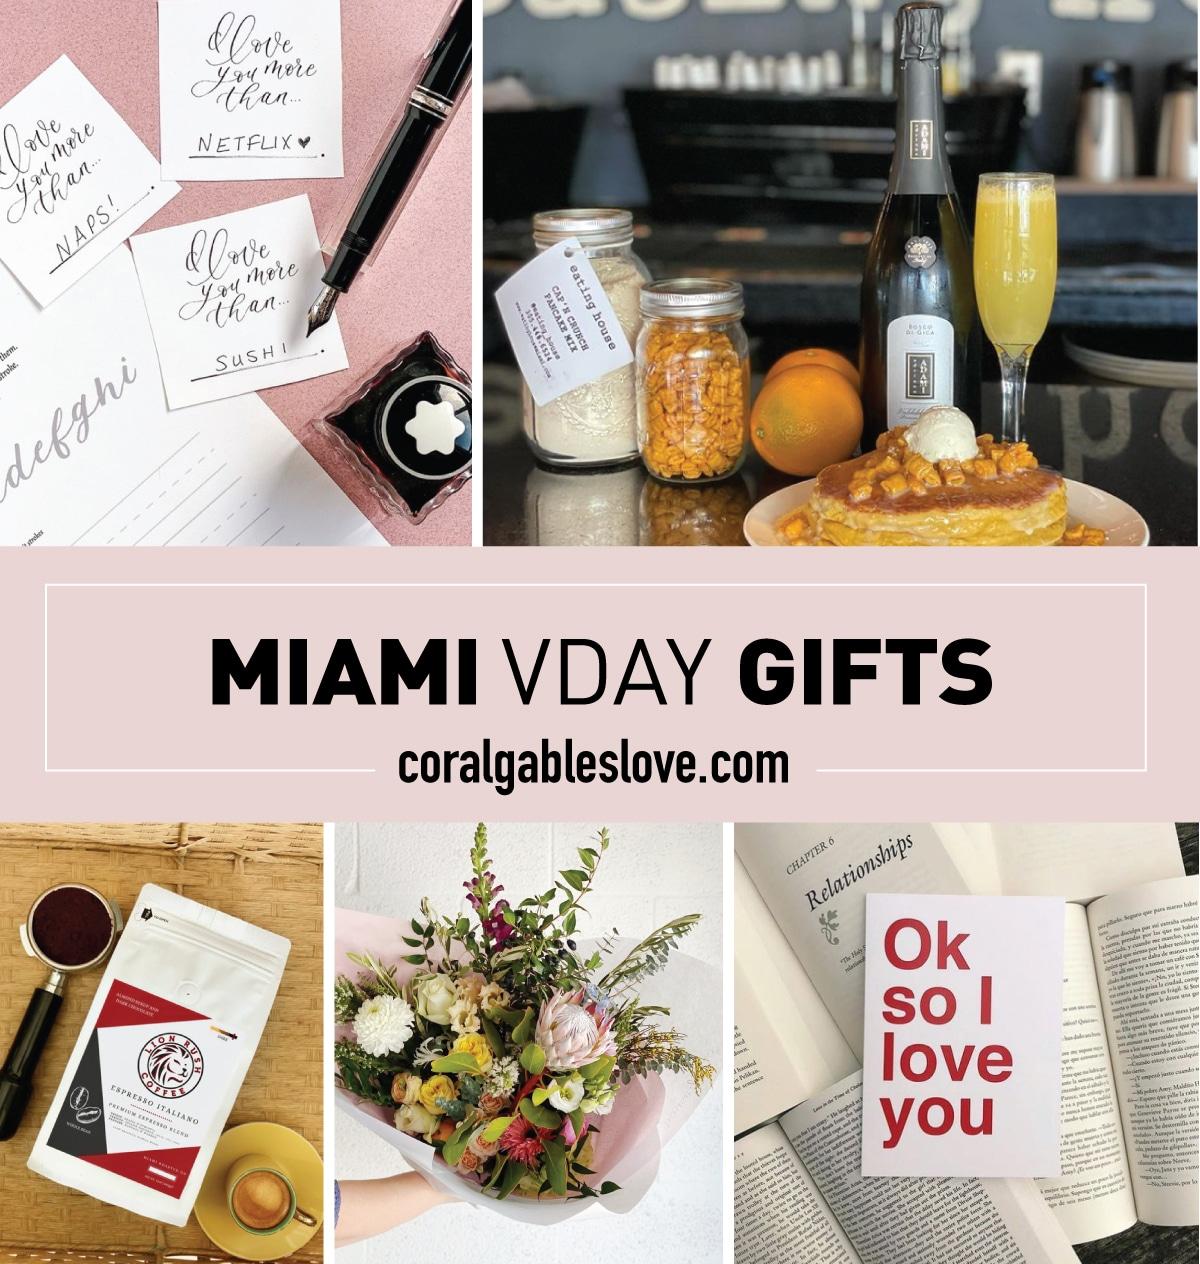 Best Last Minute Valentines Day Gift For Procrastinators in Miami